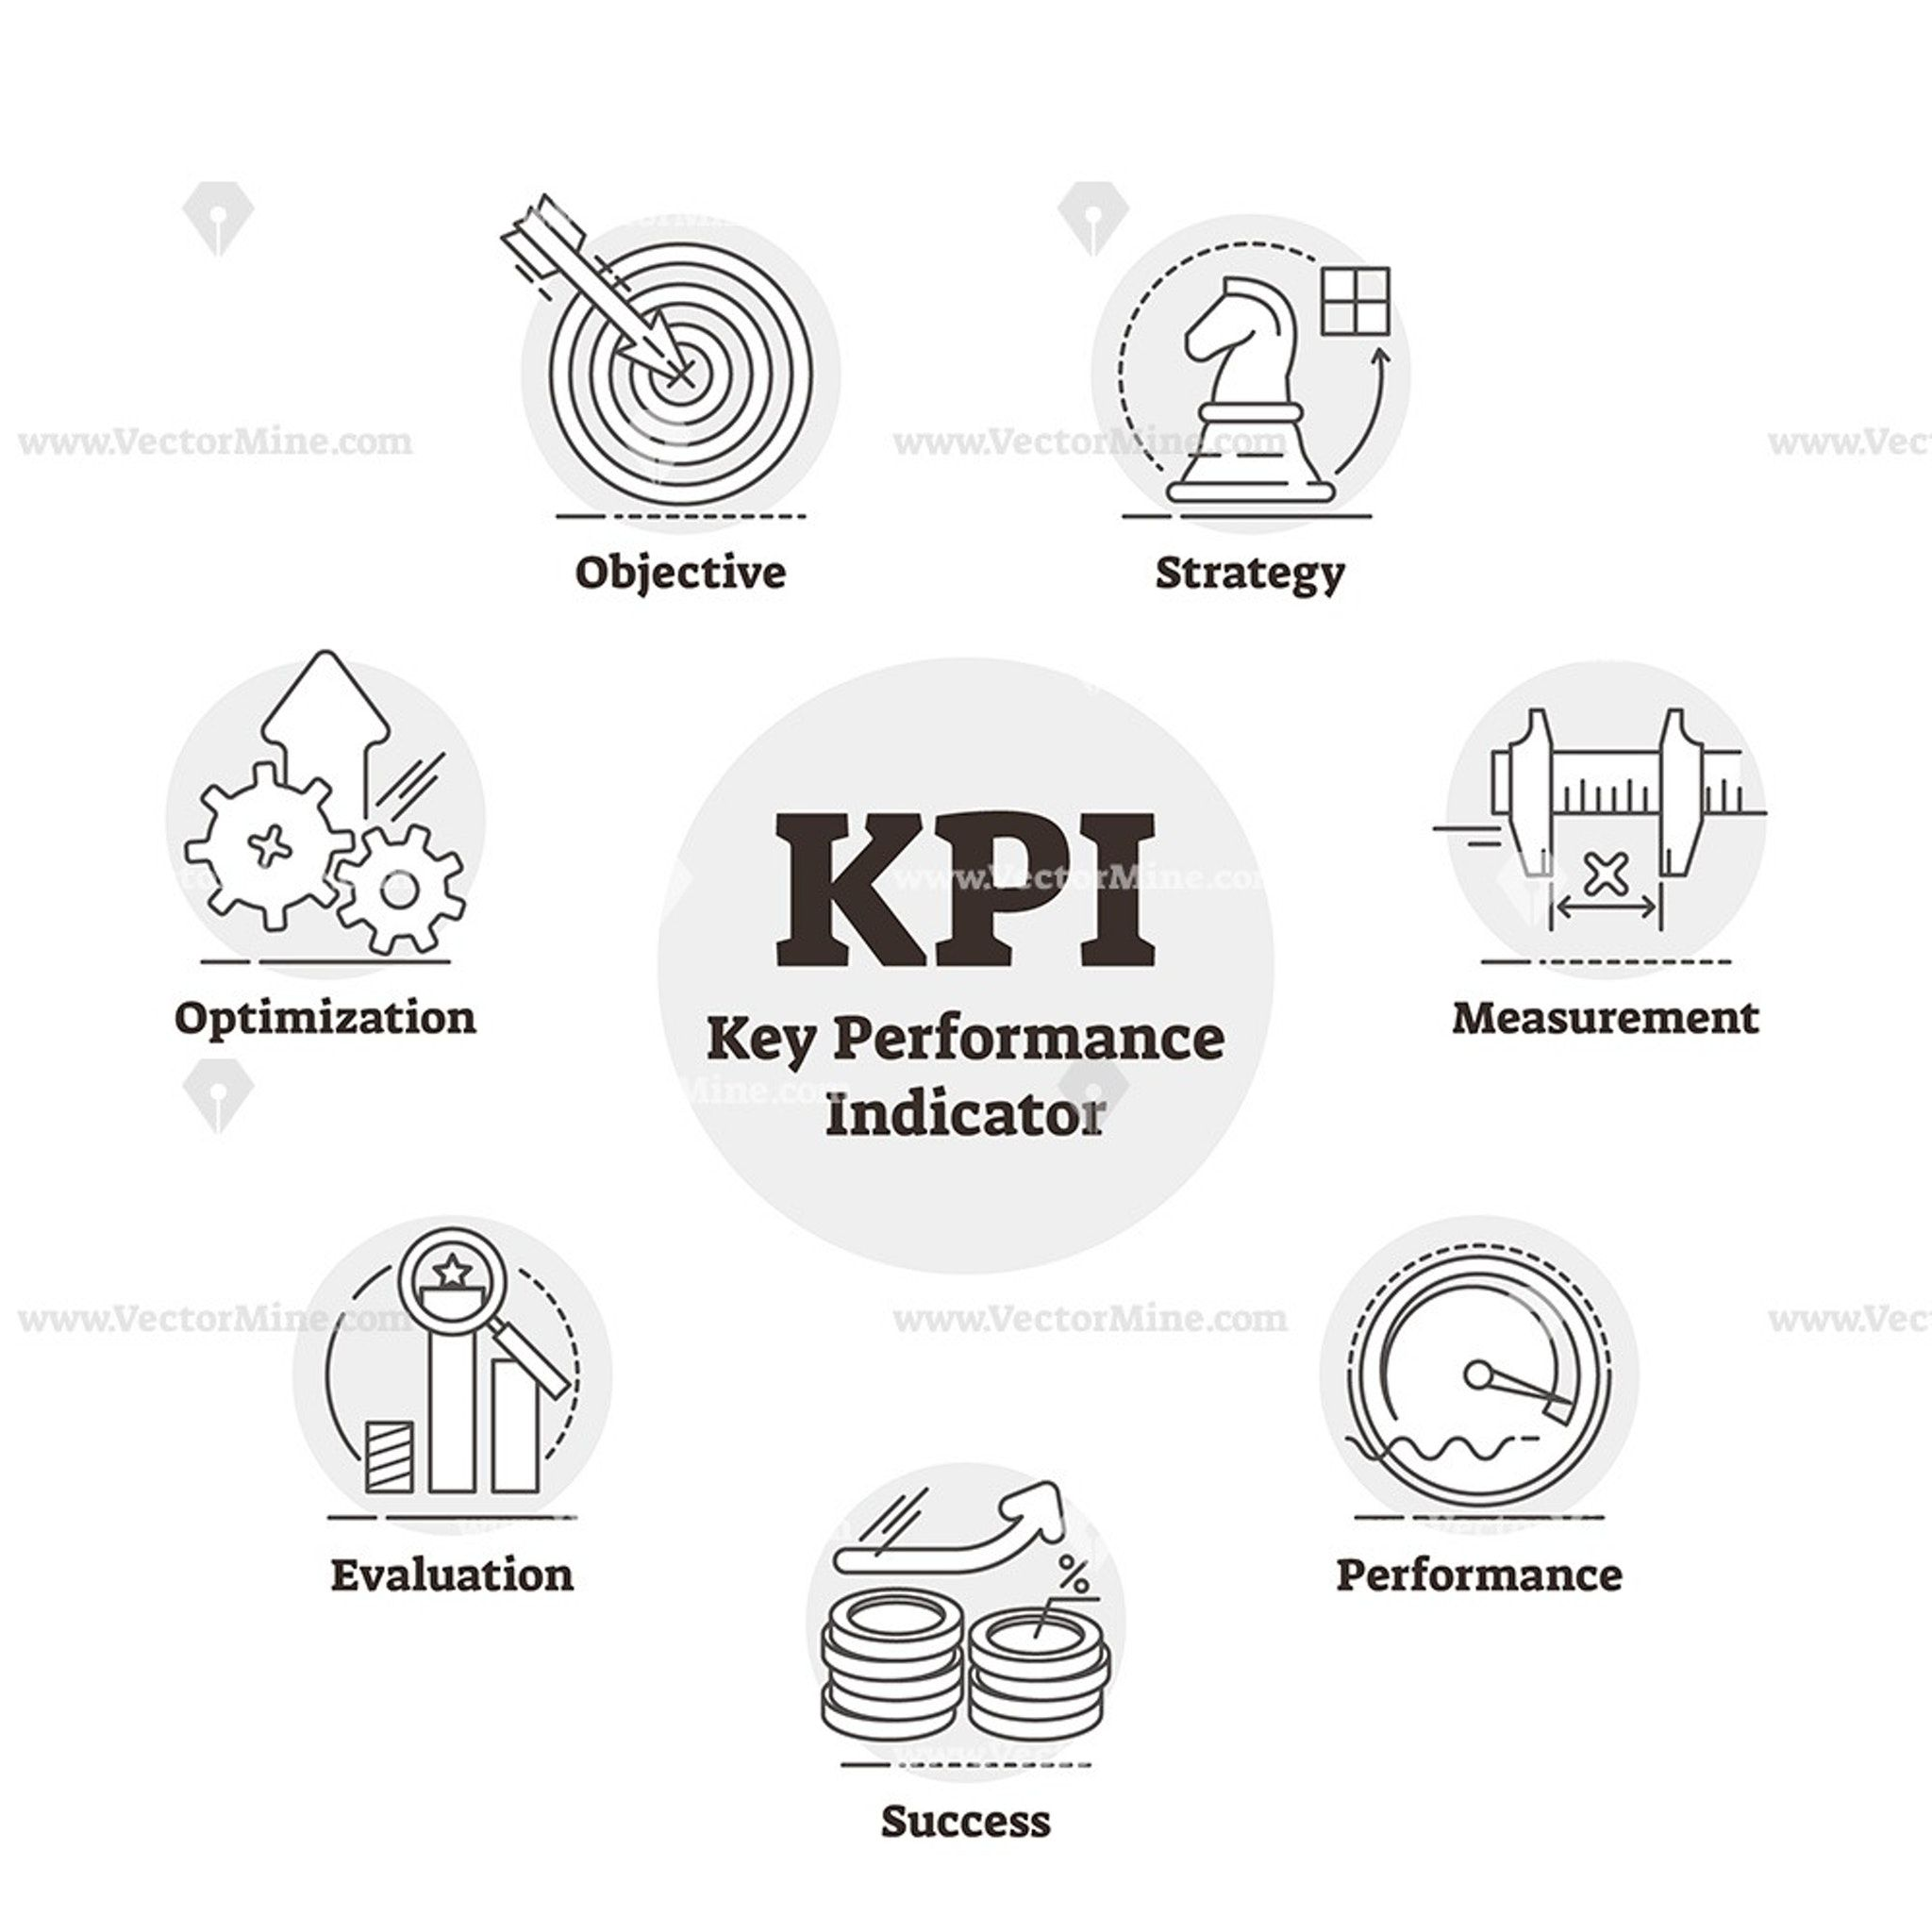 KPI or key performance indicator outline diagram vector